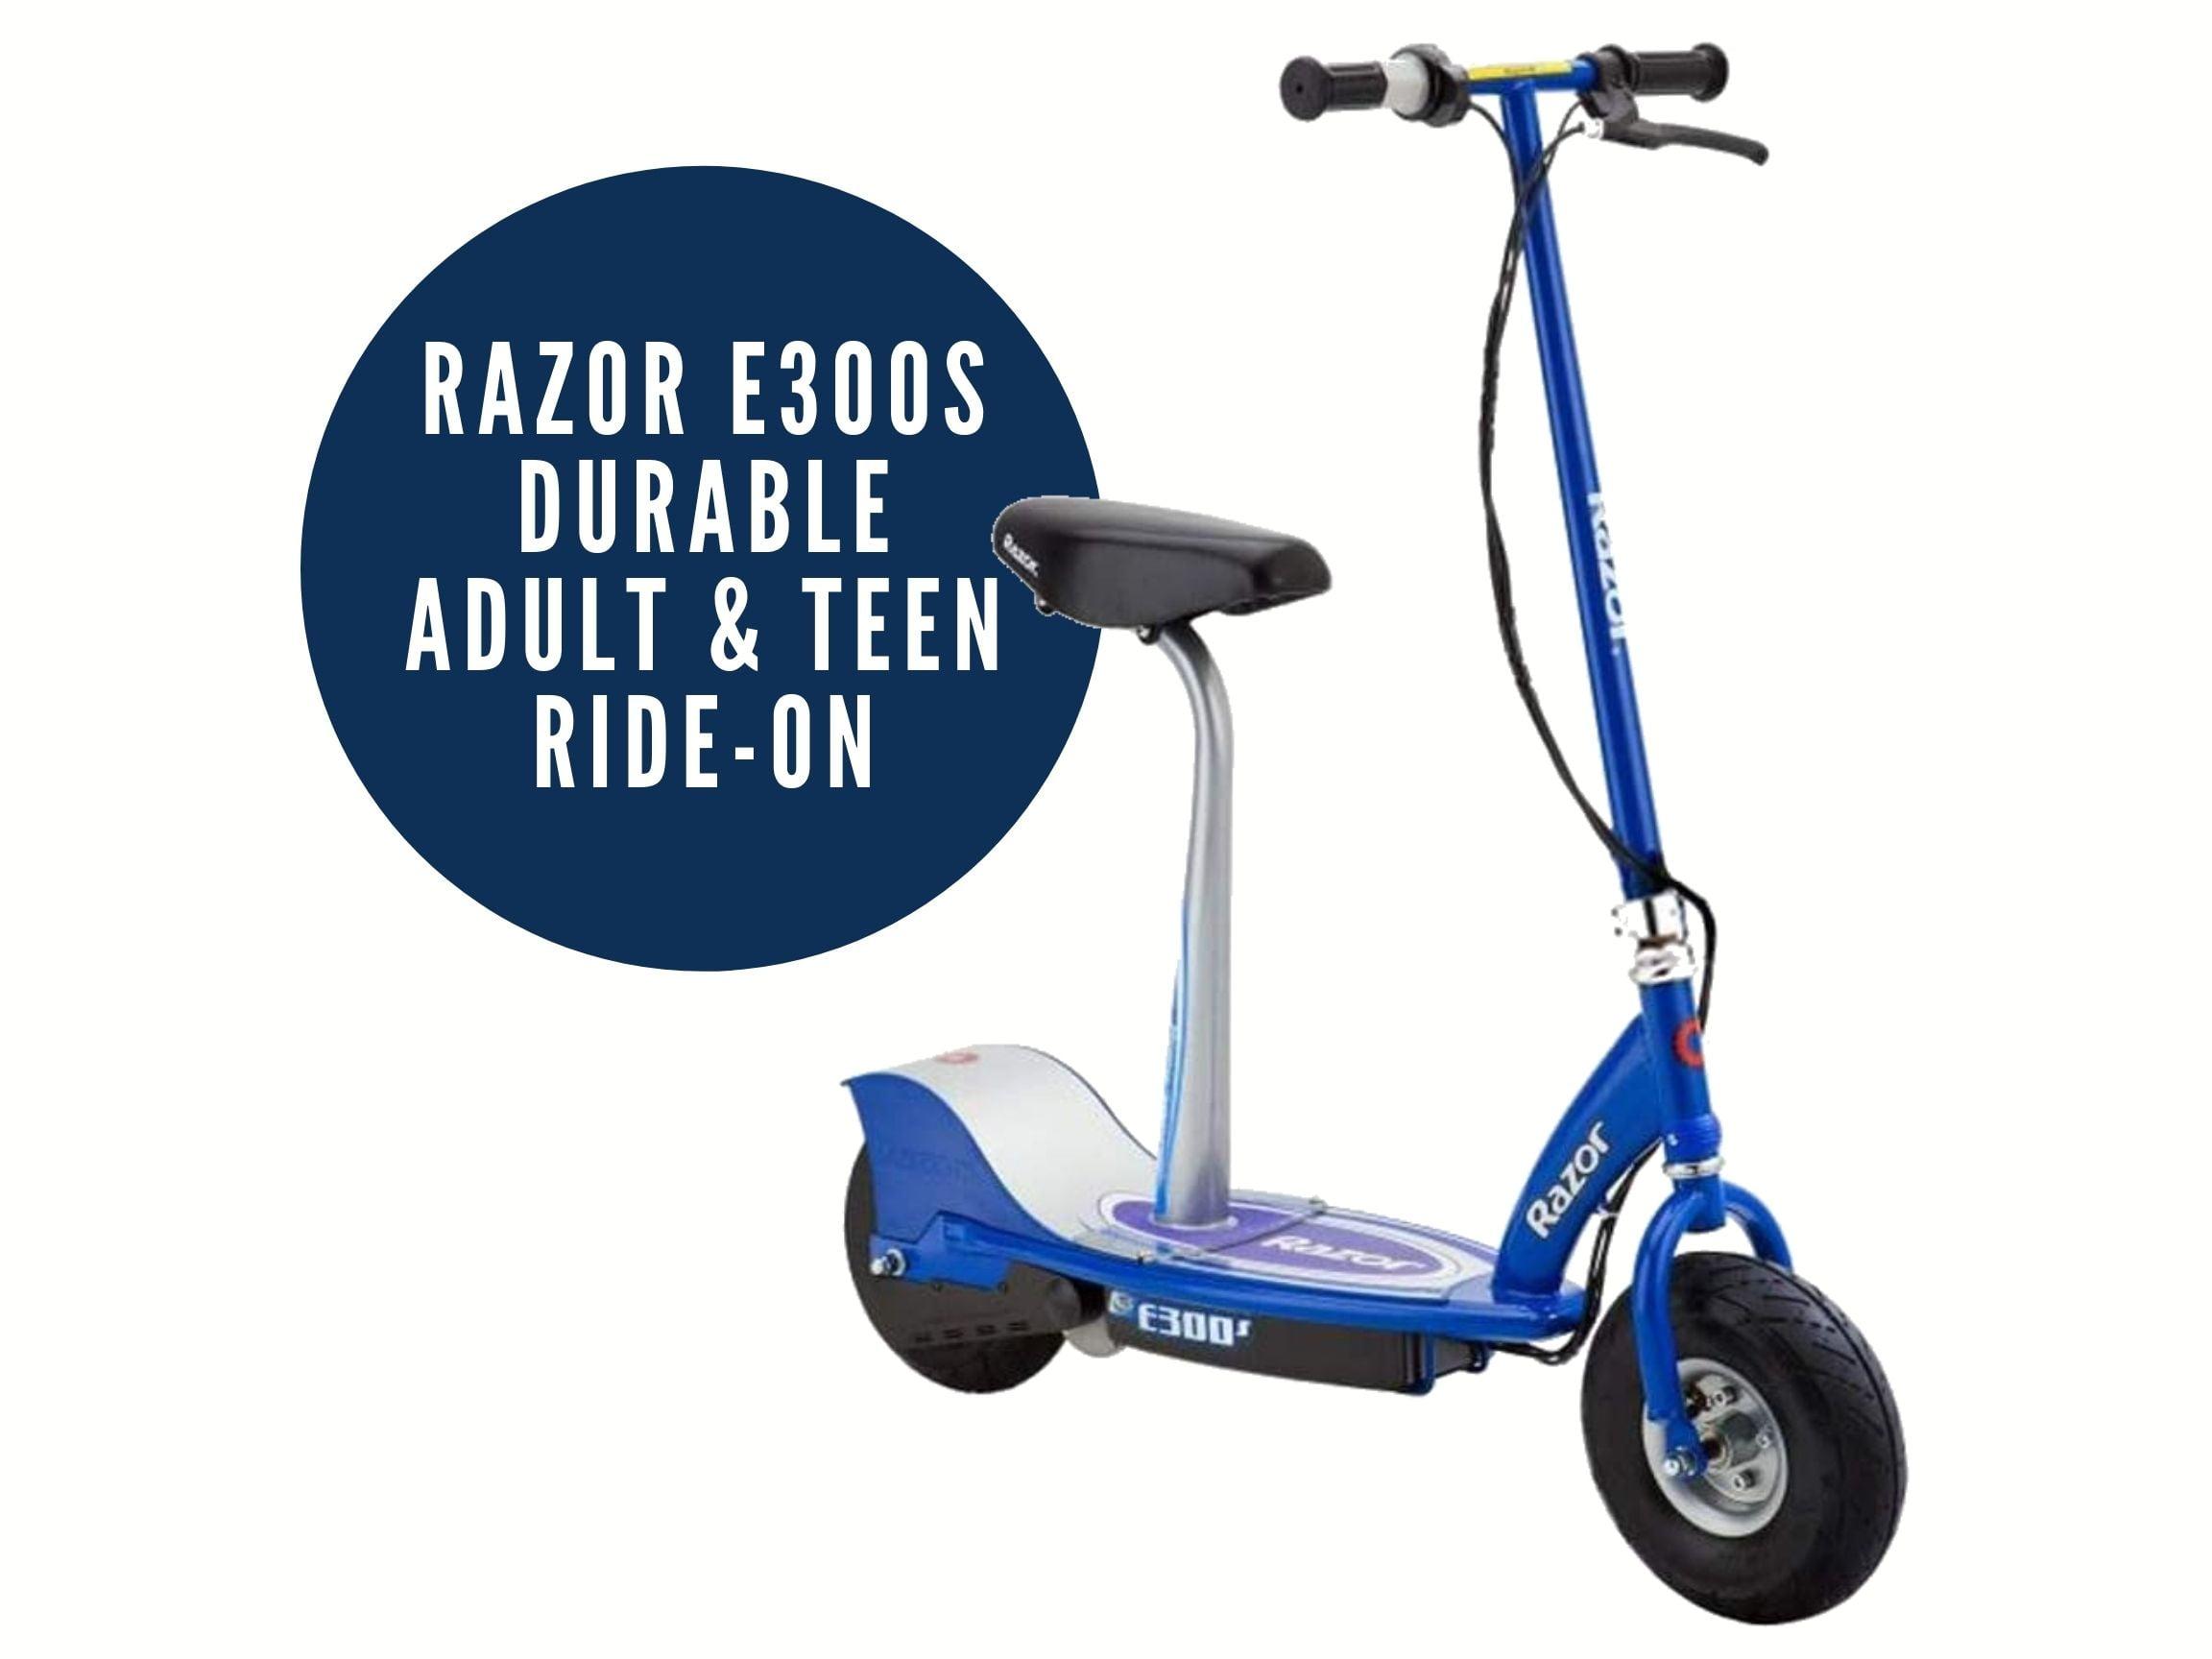 Razor 300s - the S means seat